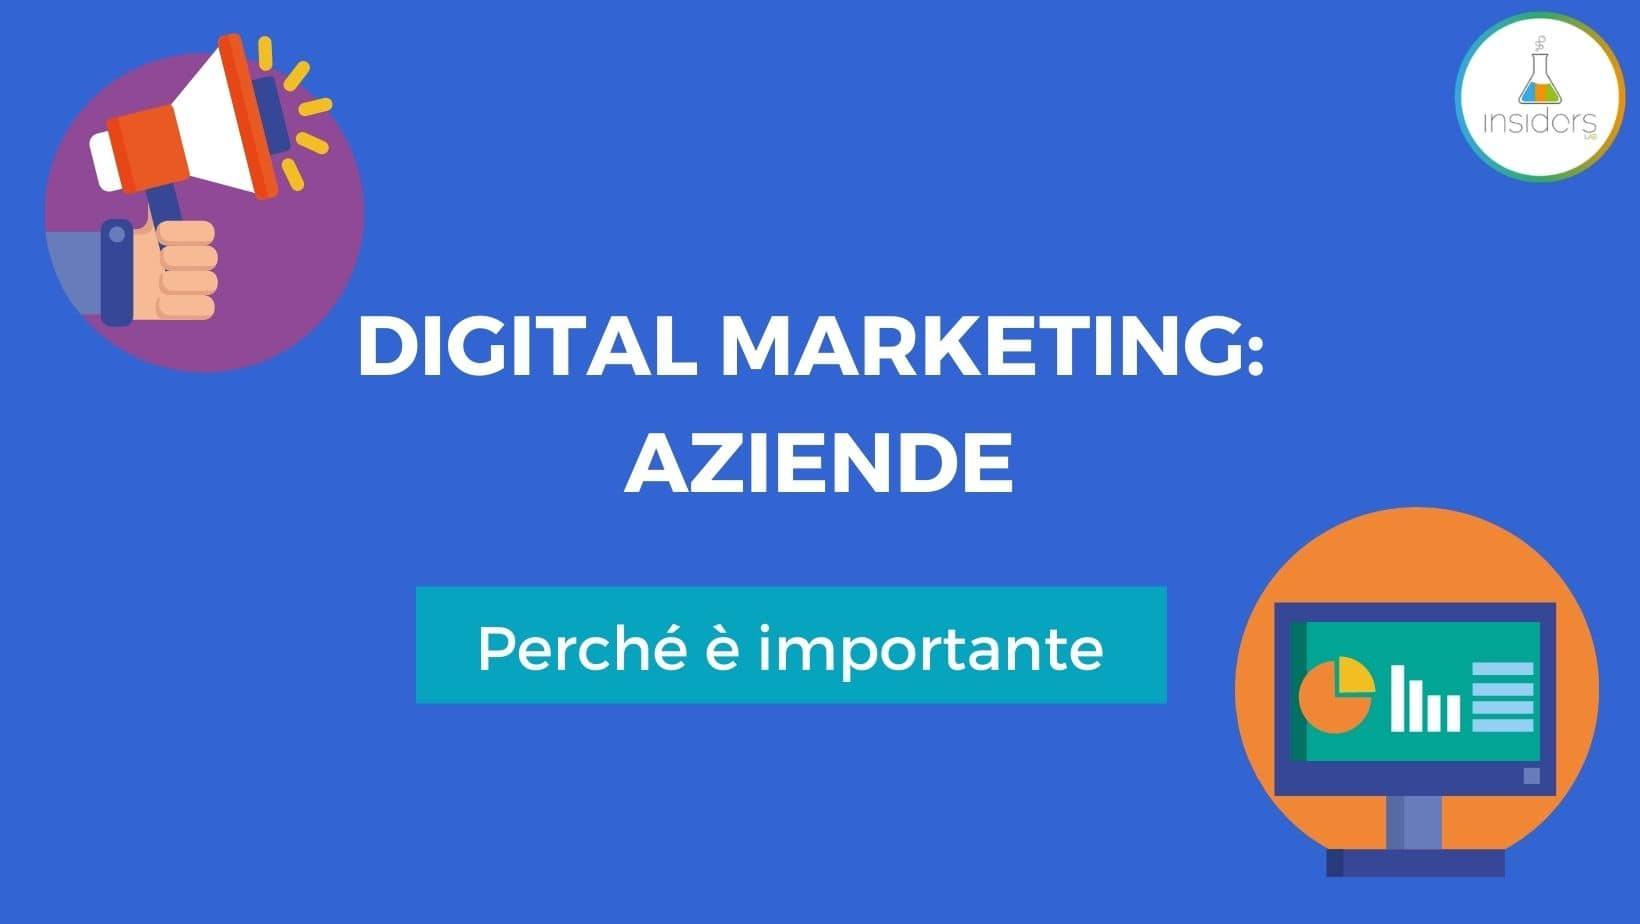 Digital Marketing per aziende